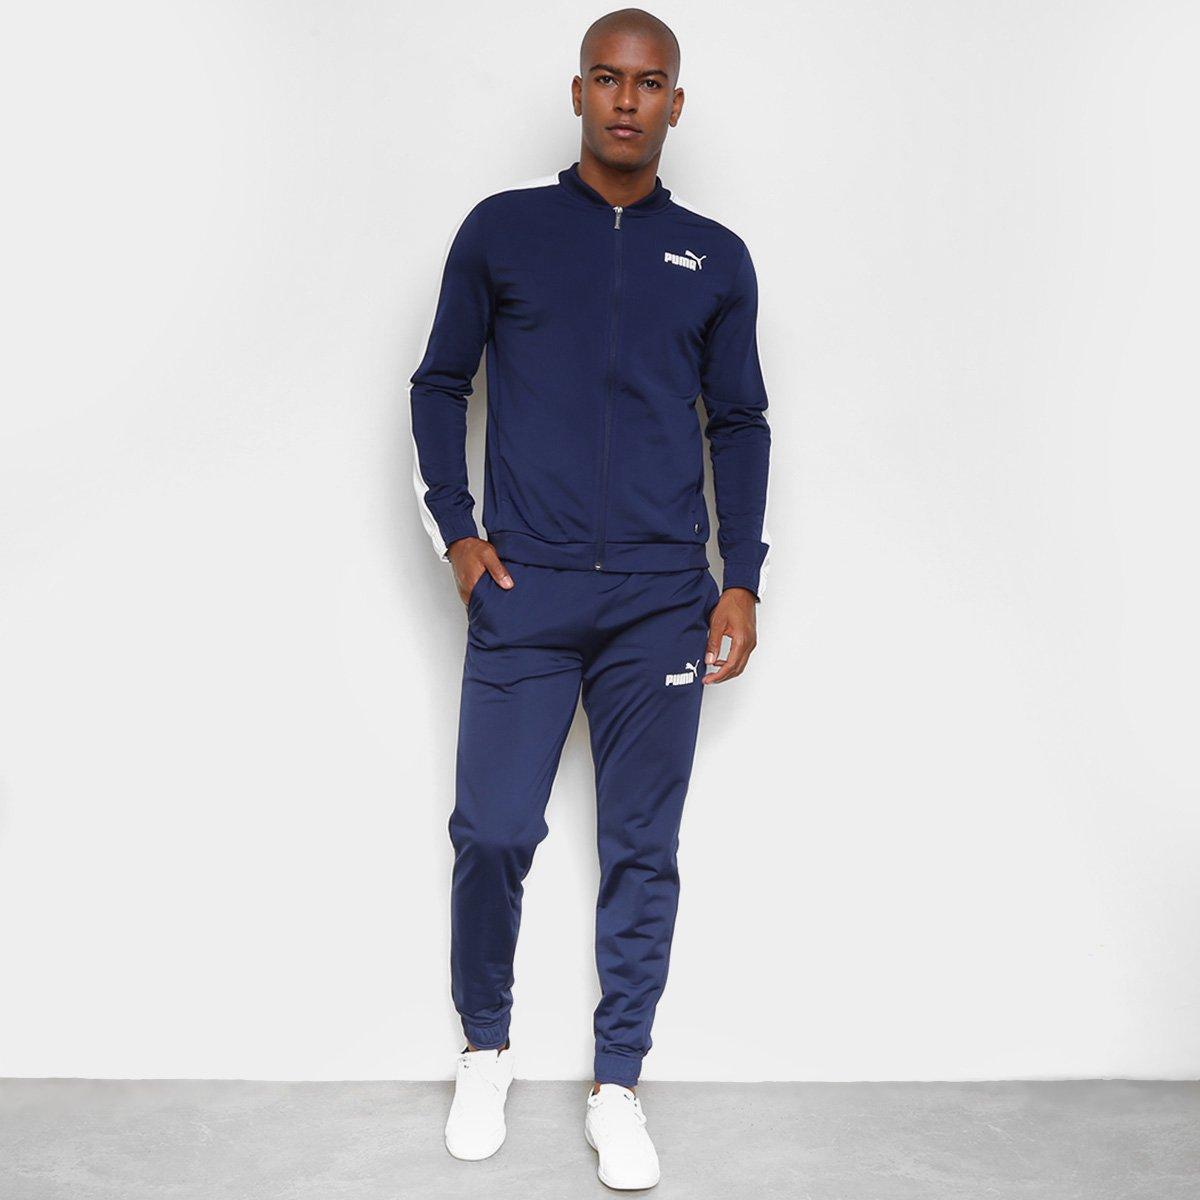 Conjunto Puma Baseball Tricot Suit Masculina